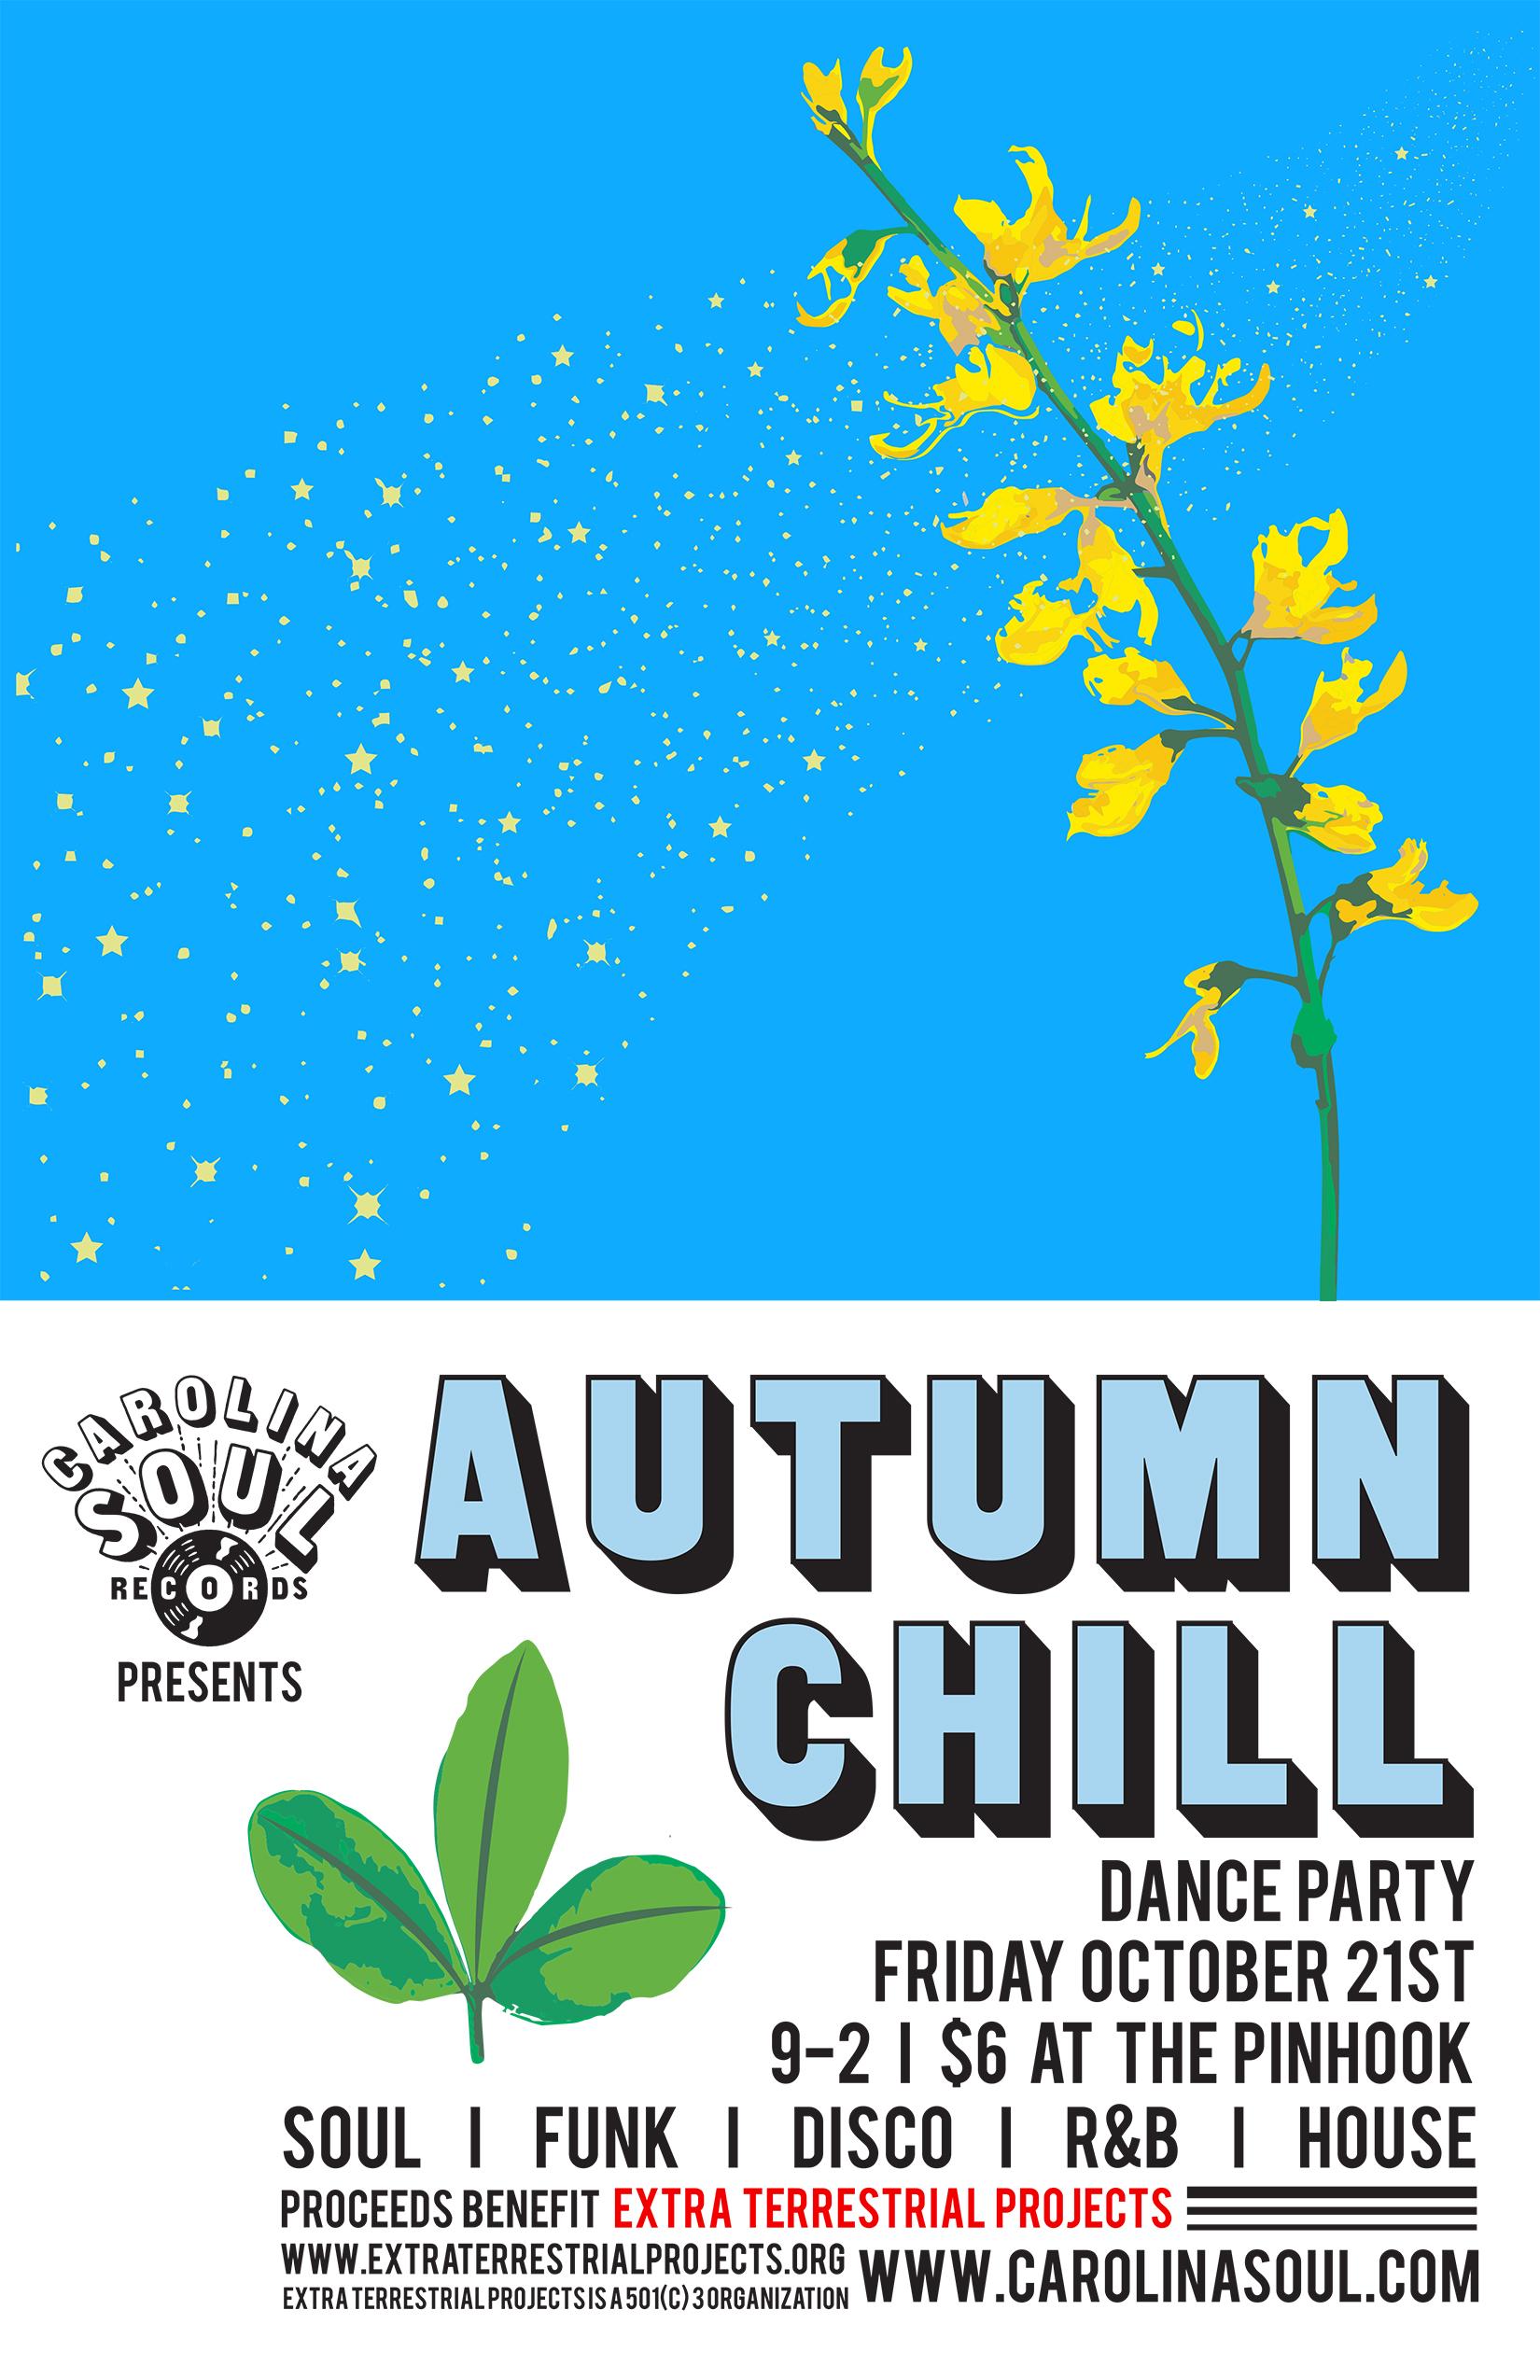 Carolina Soul Autumn Chill 11x17 Poster.jpg